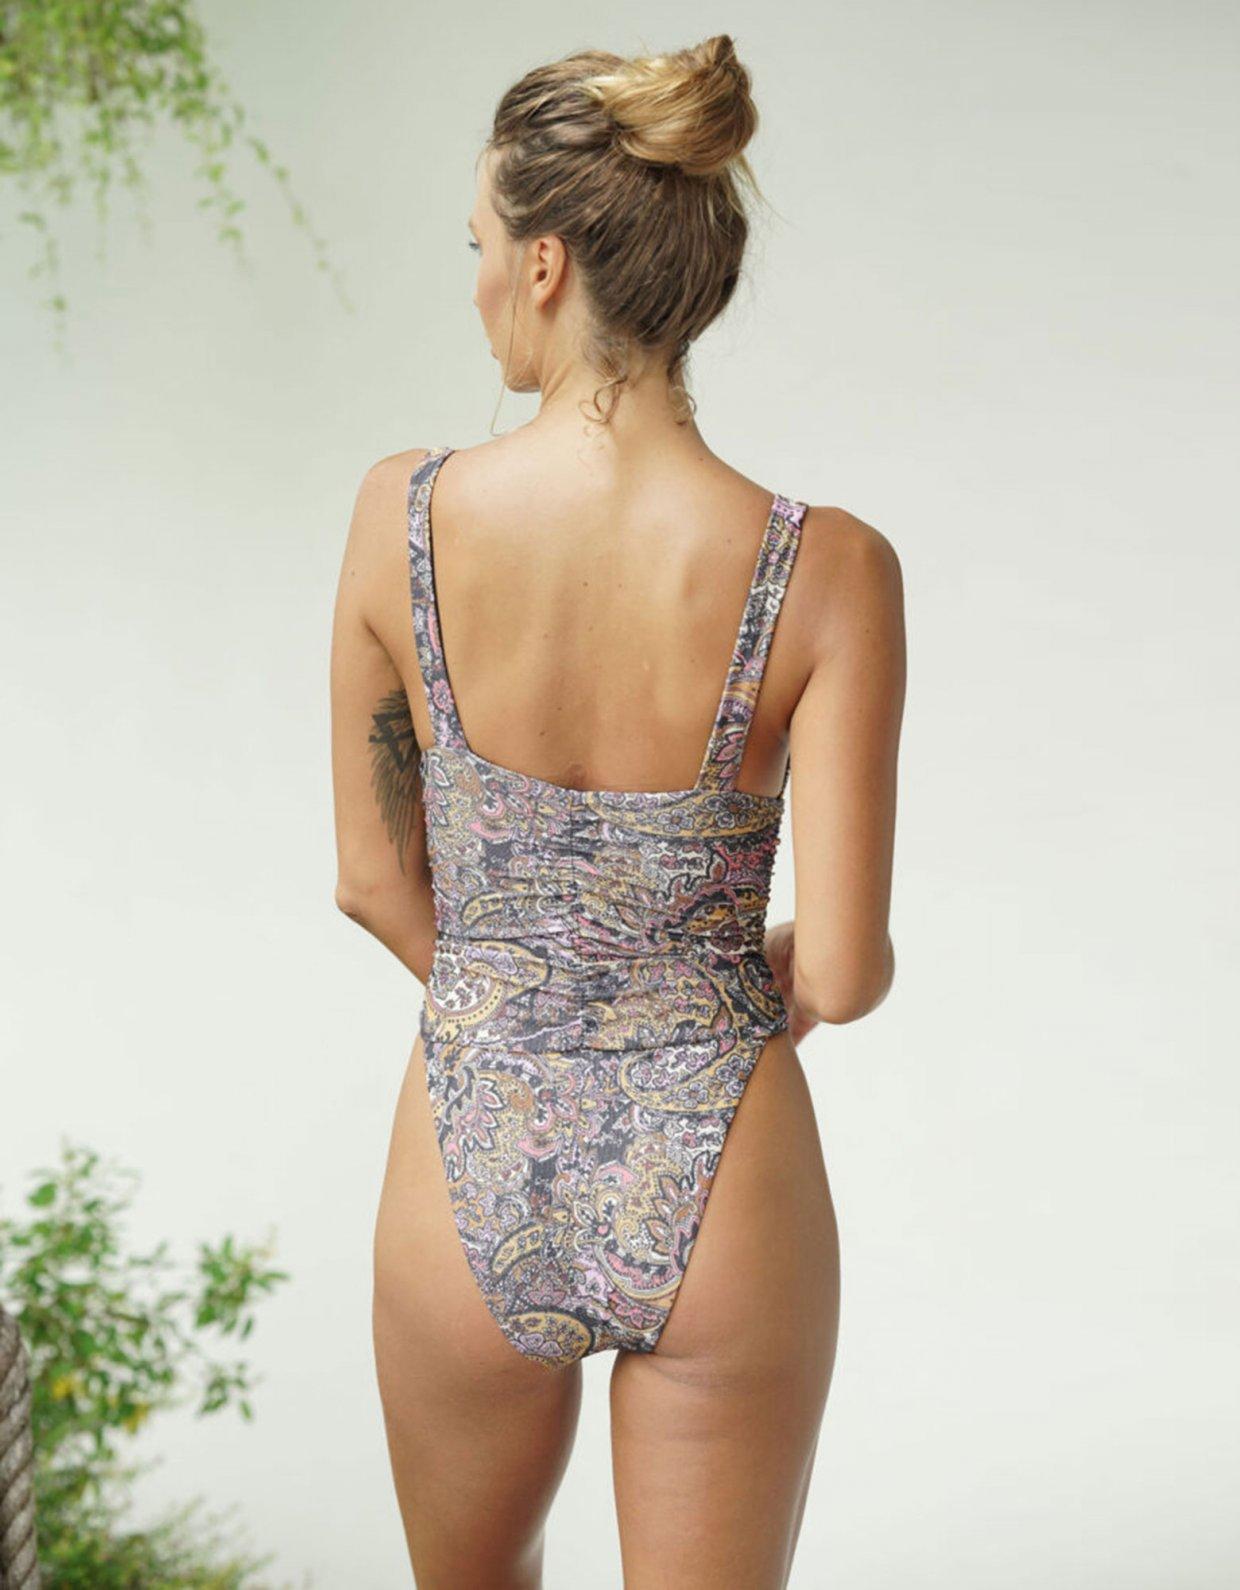 Lookseri swimwear Donna paisley one-piece swimsuit